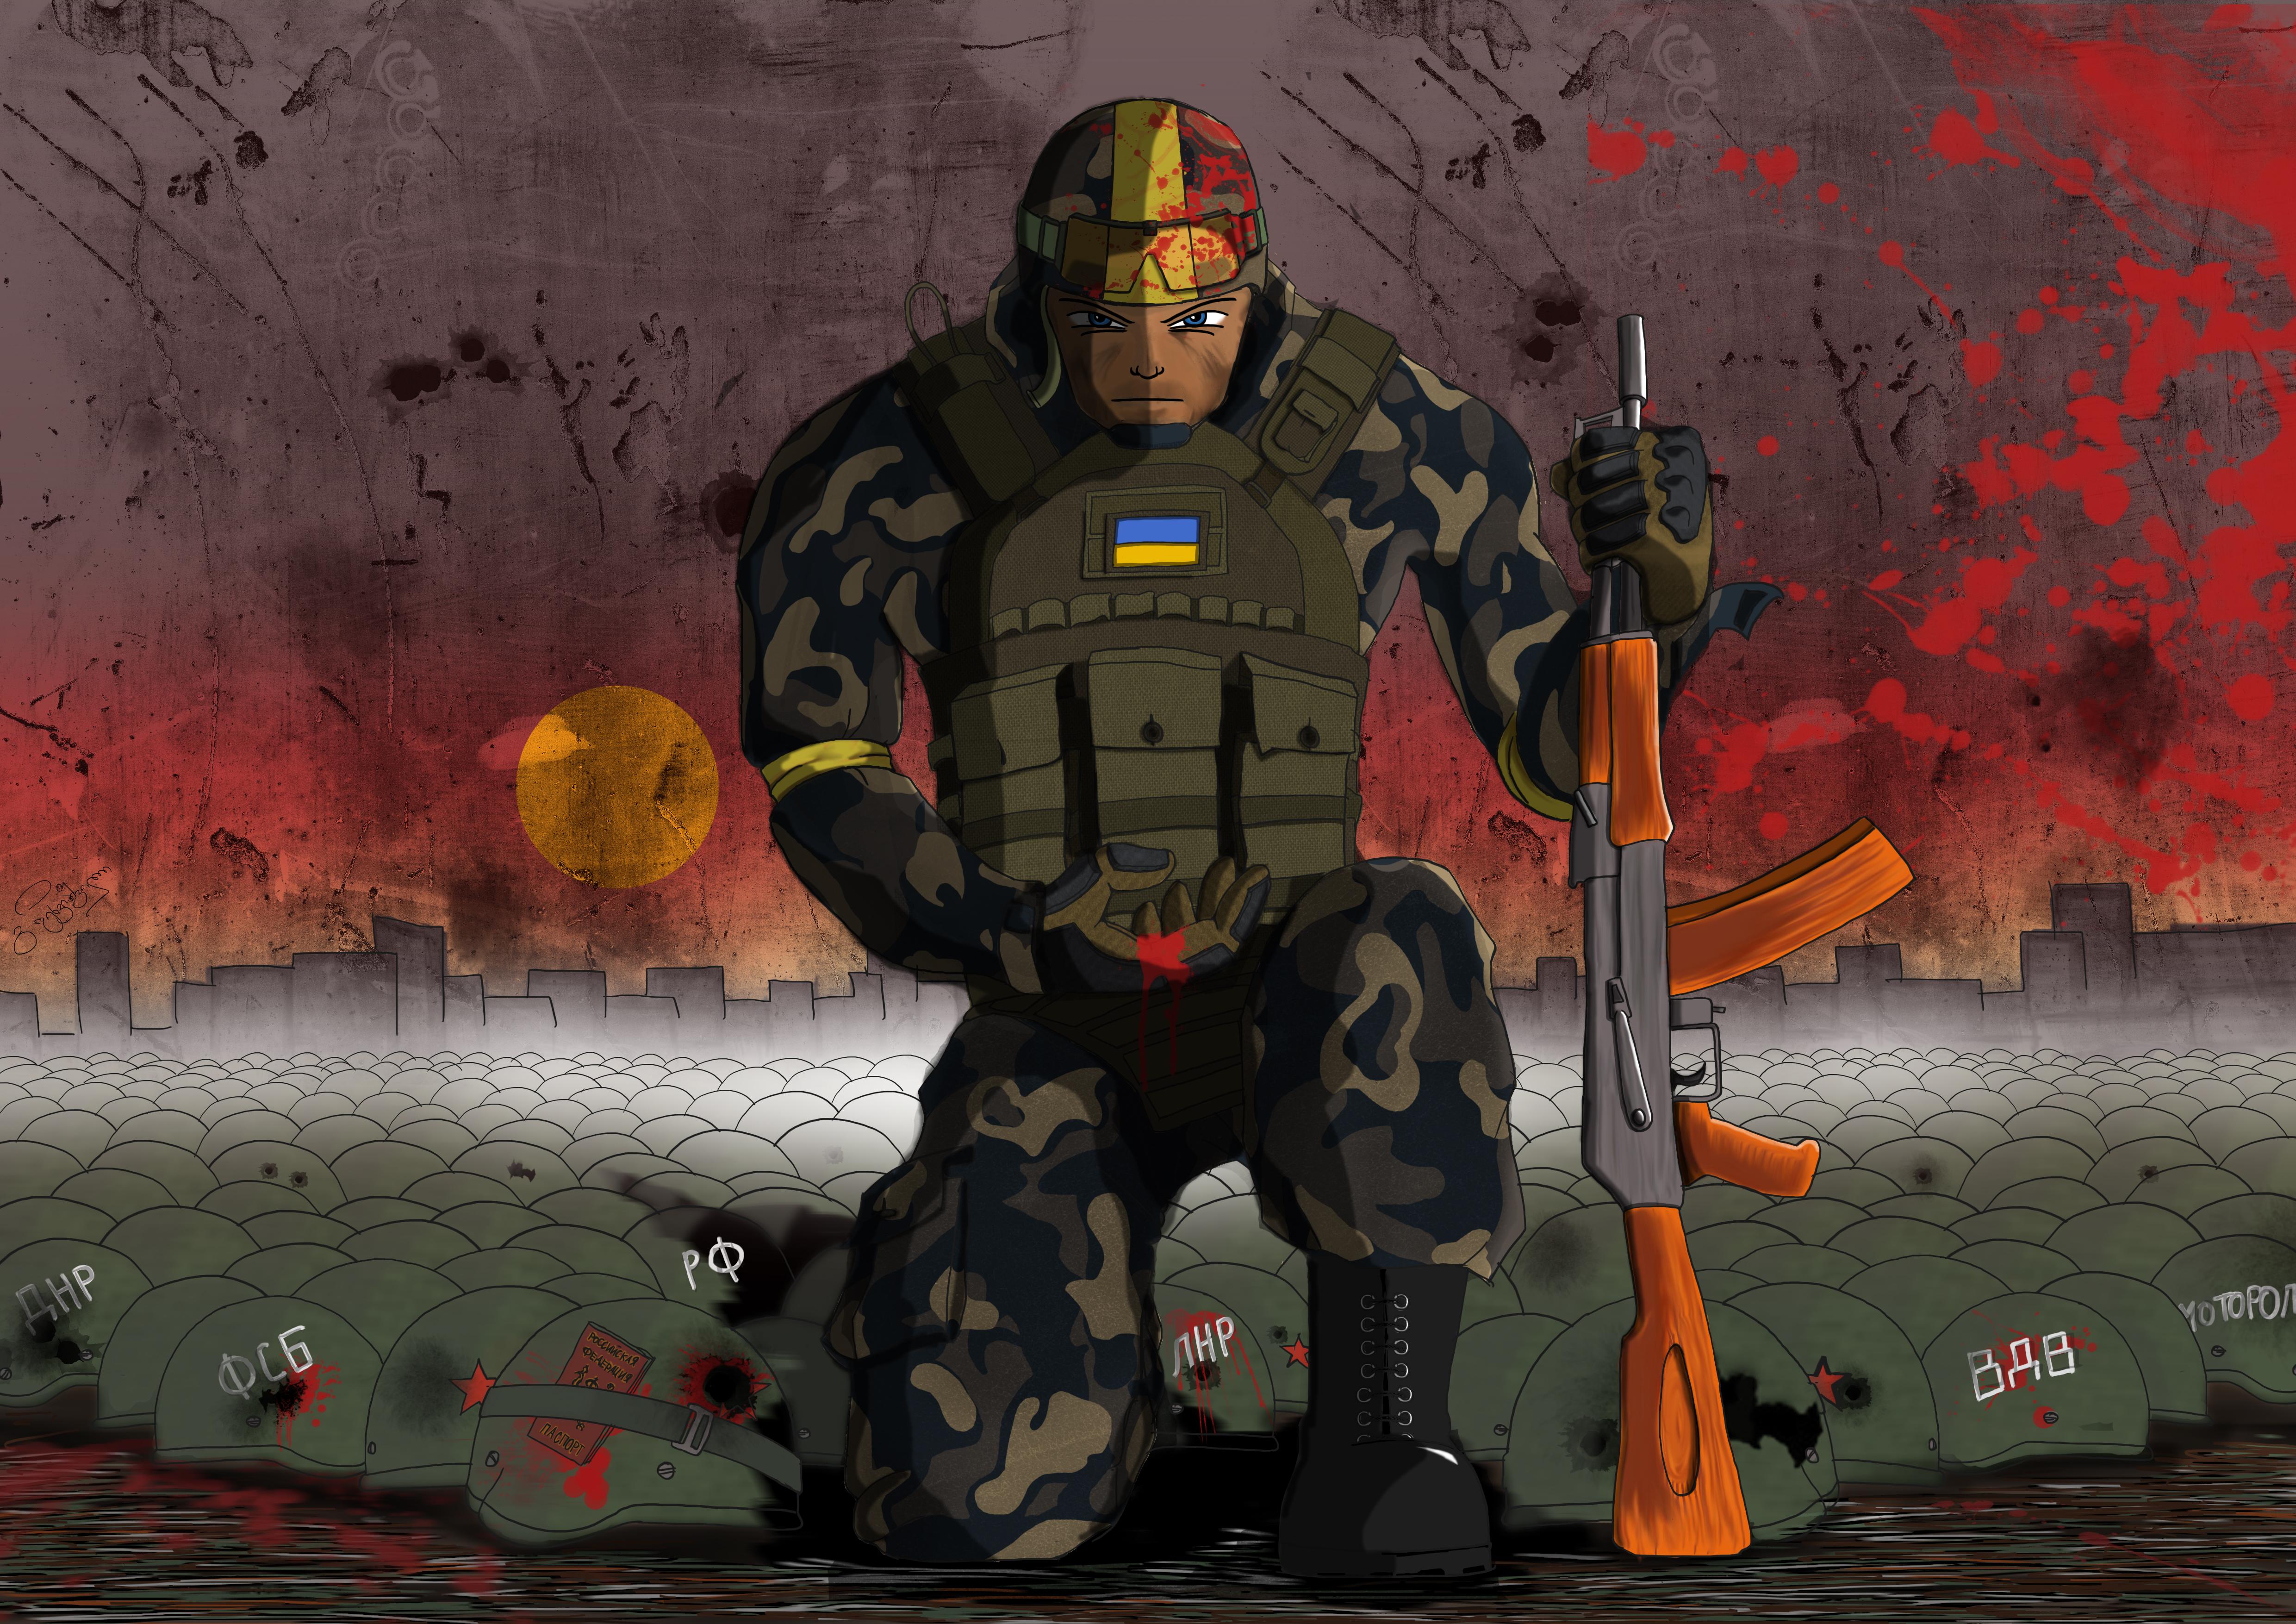 For Ukraine